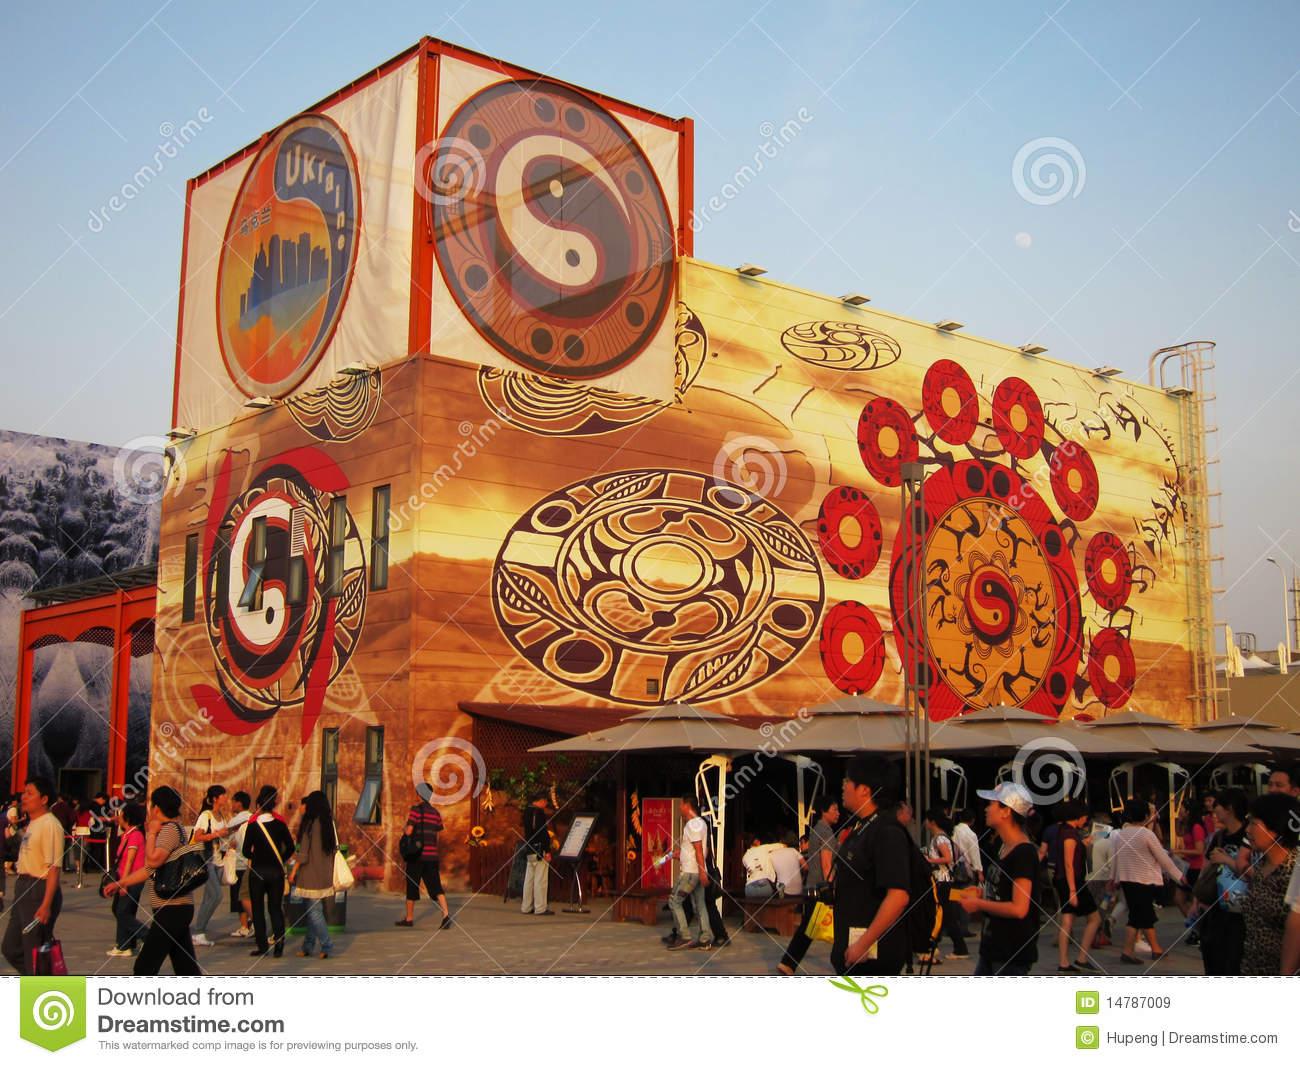 2010-shanghai-expo-ukraine-pavilion-14787009